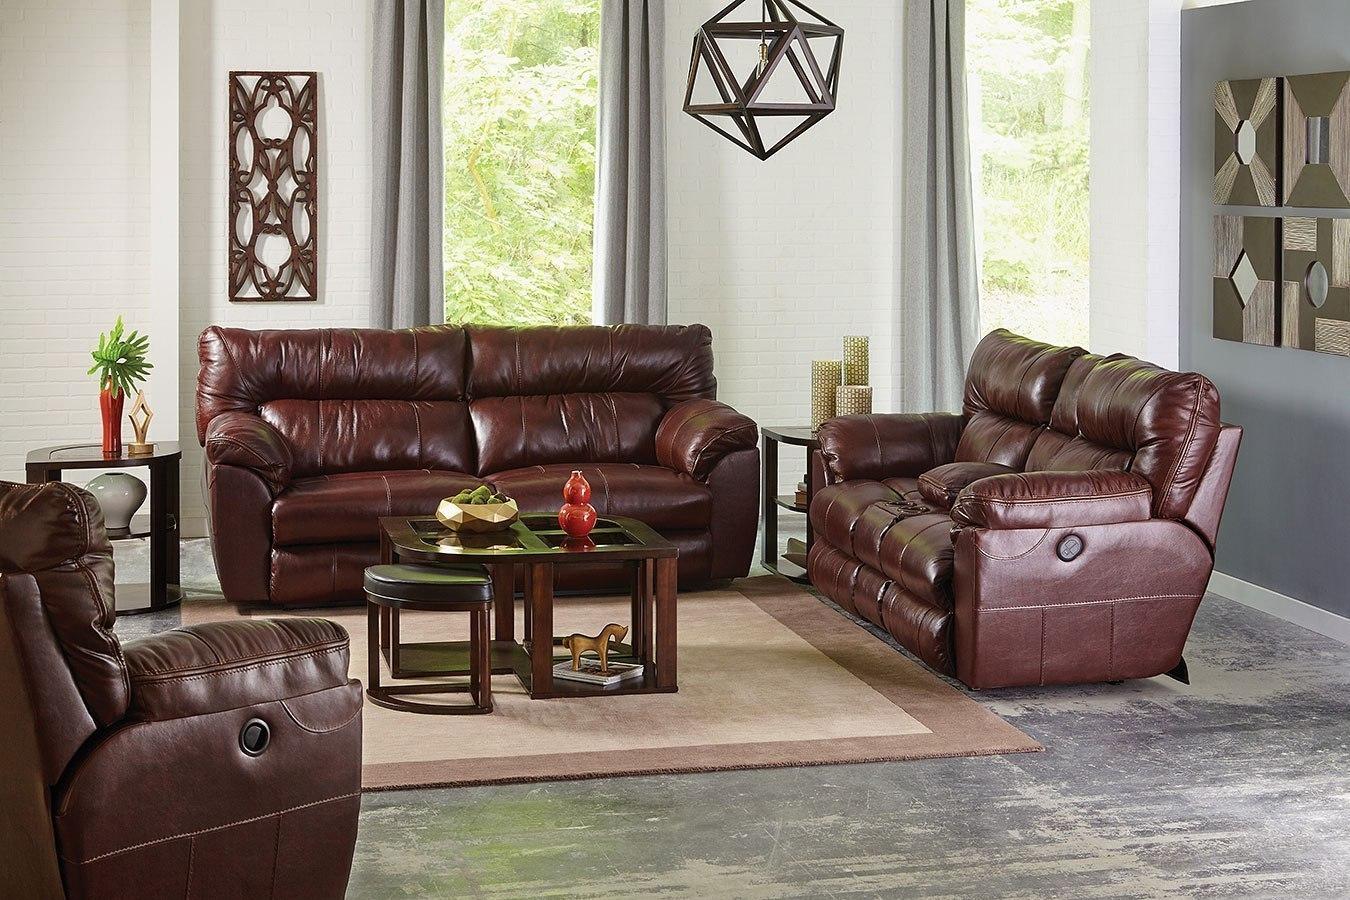 milan lay flat reclining living room set walnut. Black Bedroom Furniture Sets. Home Design Ideas